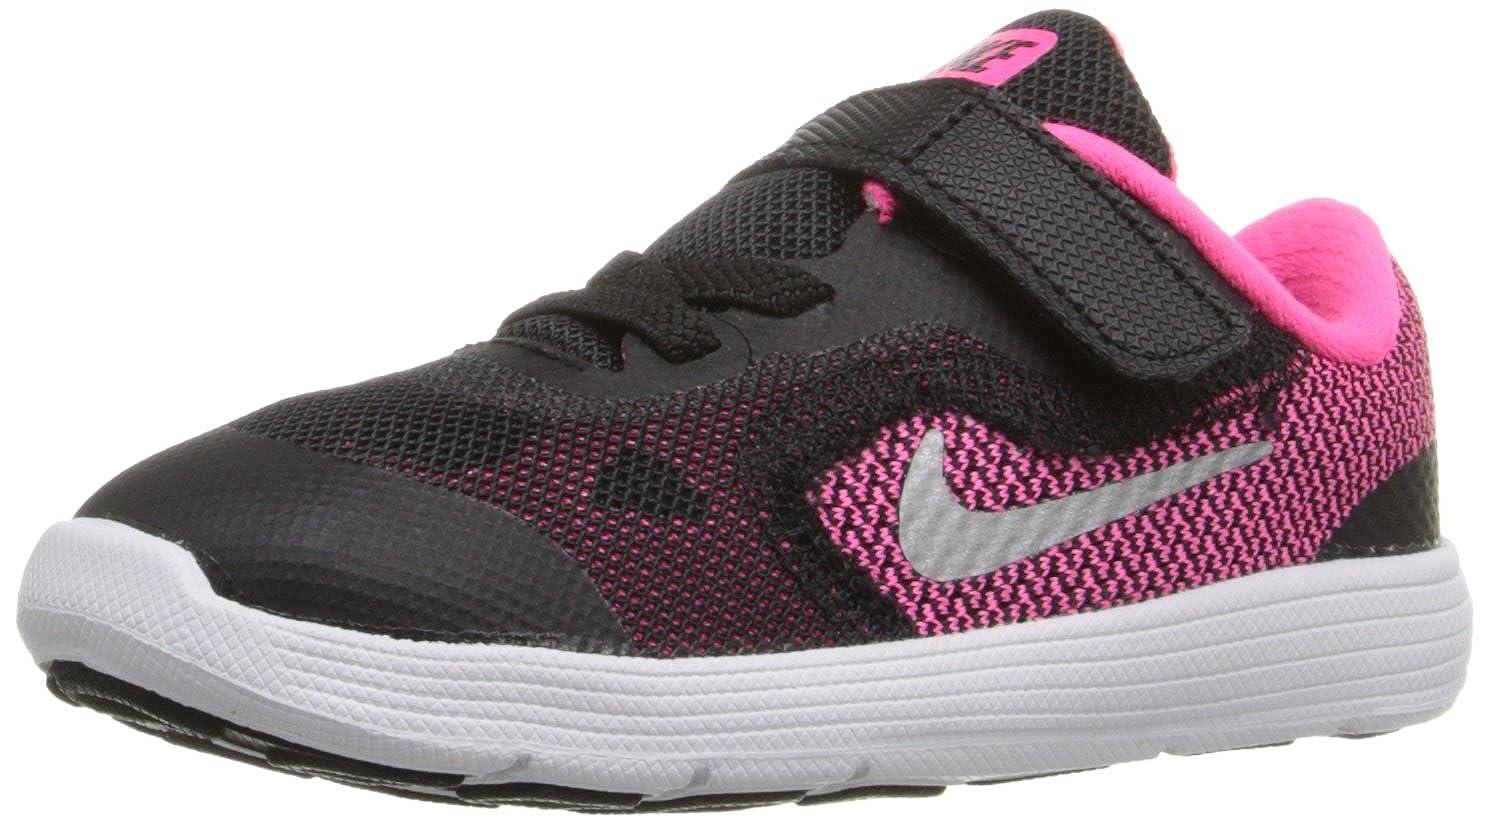 Nike Revolution 3 (TDV), Zapatos de recié n Nacido para Bebé s Zapatos de recién Nacido para Bebés